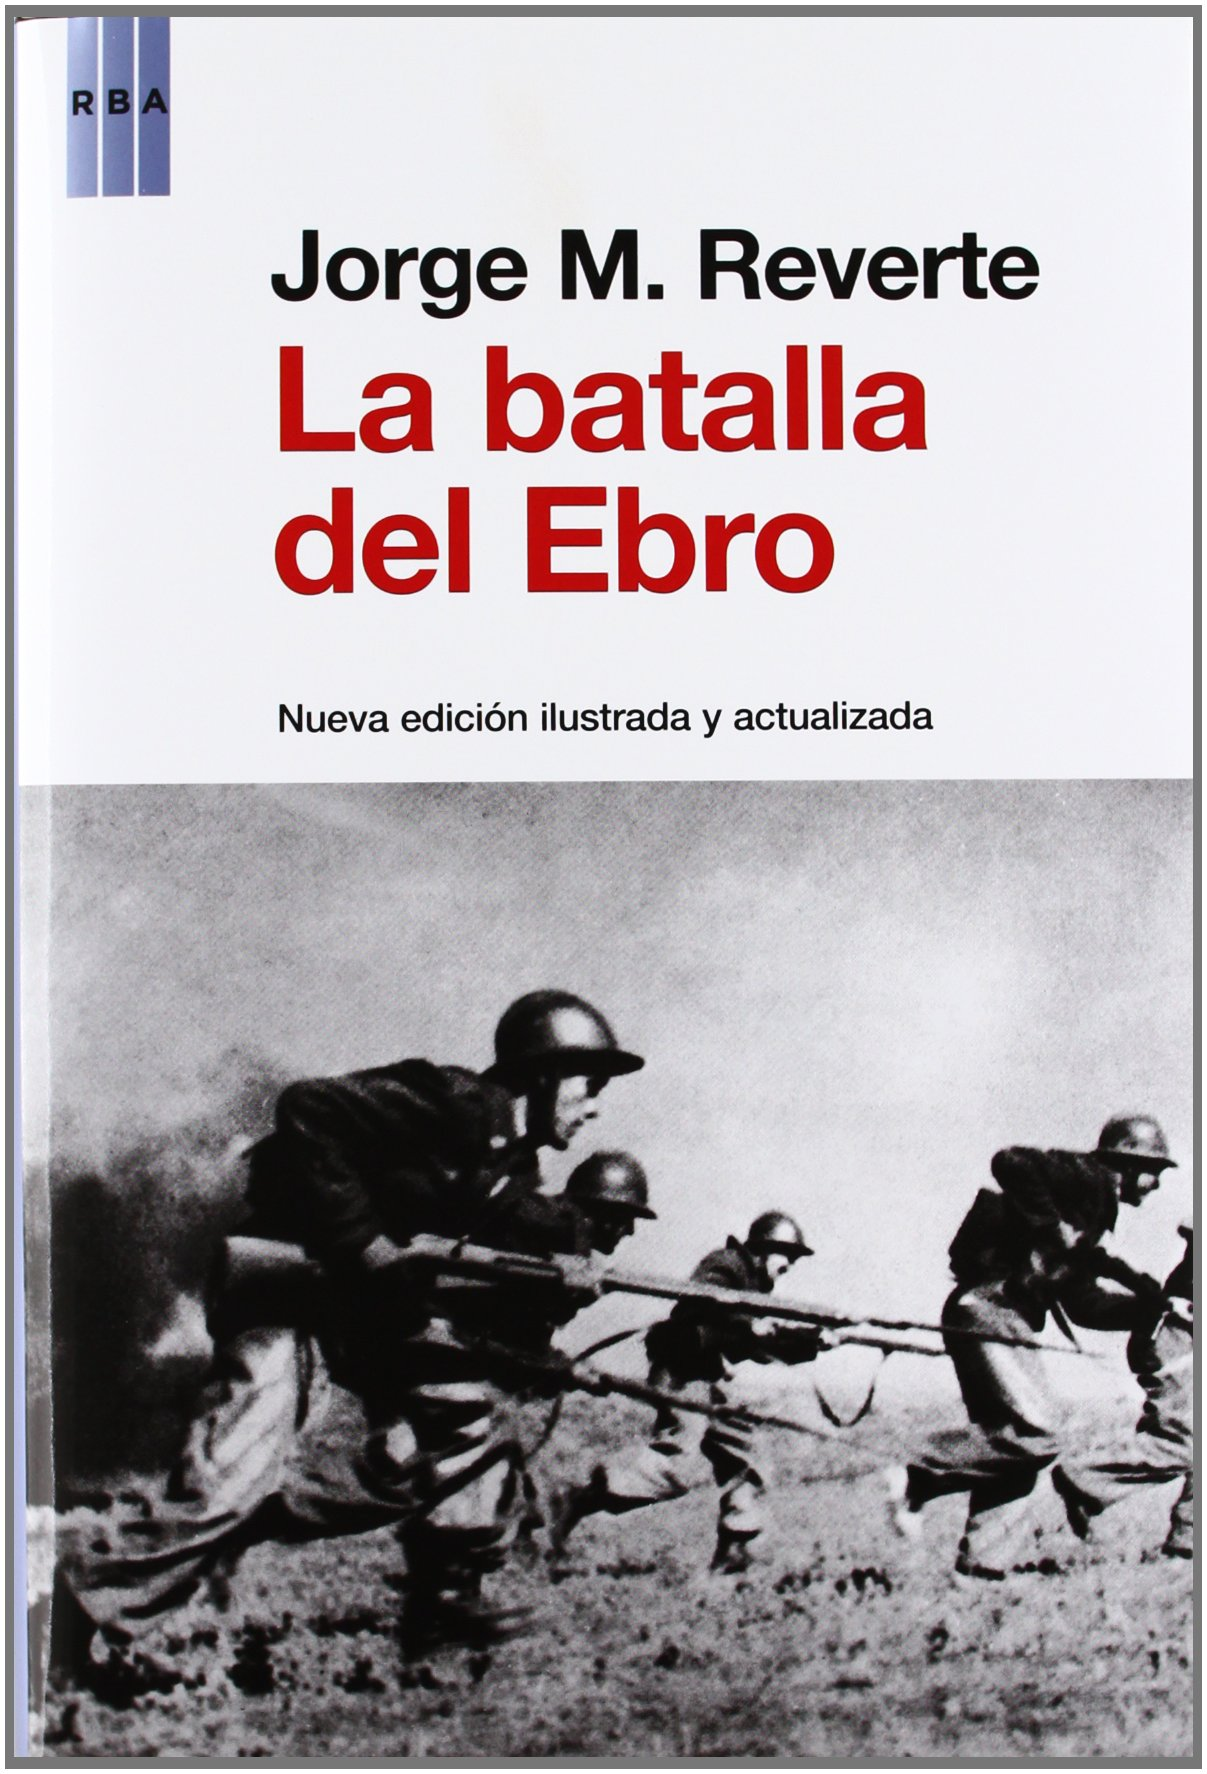 La batalla del Ebro (ENSAYO Y BIOGRAFIA): Amazon.es: M. Reverte, JORGE: Libros